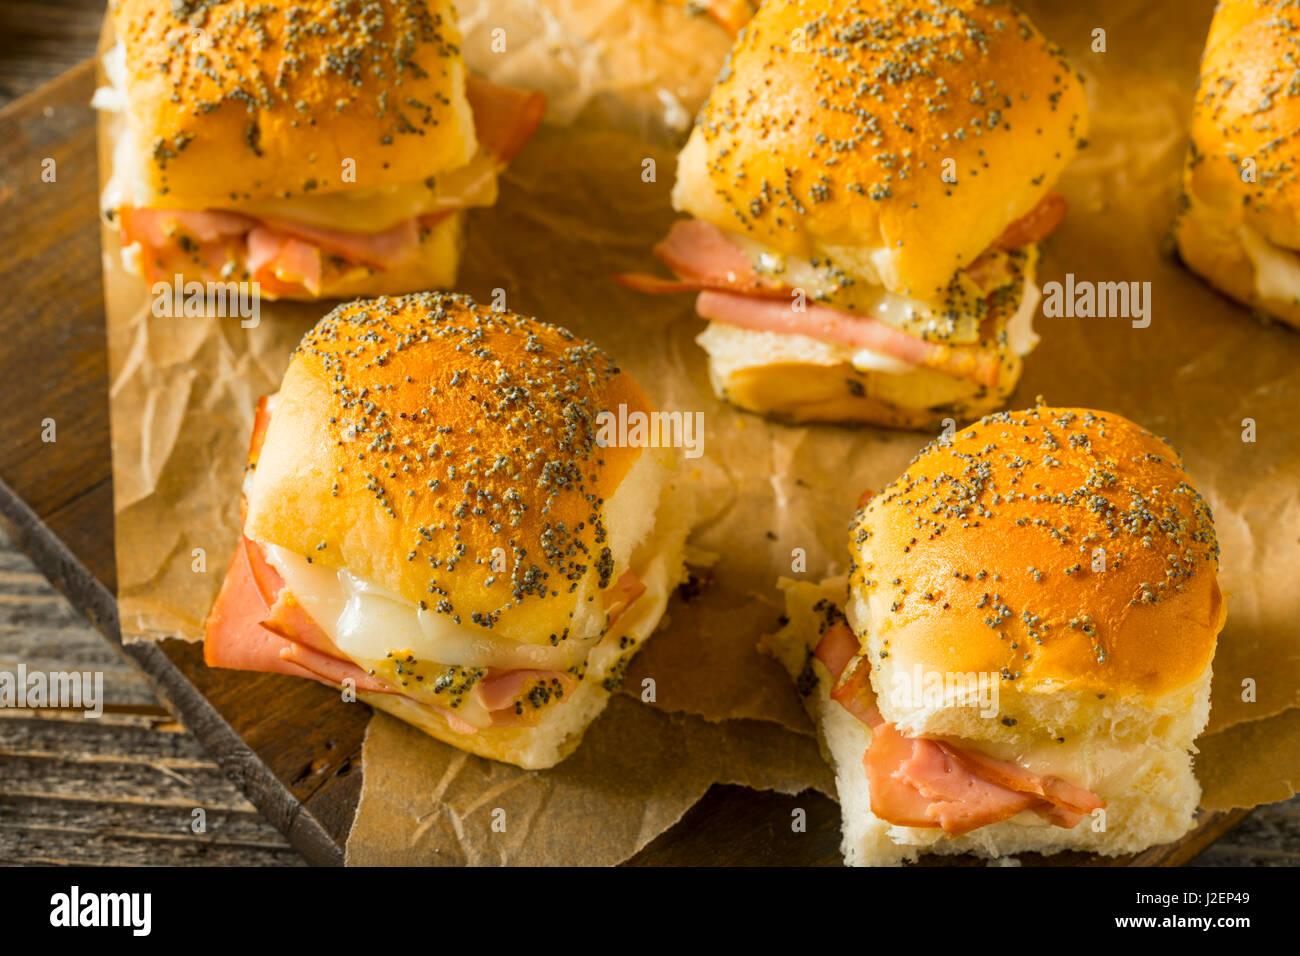 Hawaiian Ham and Cheese Buns with Mayo and Poppy Seeds - Stock Image